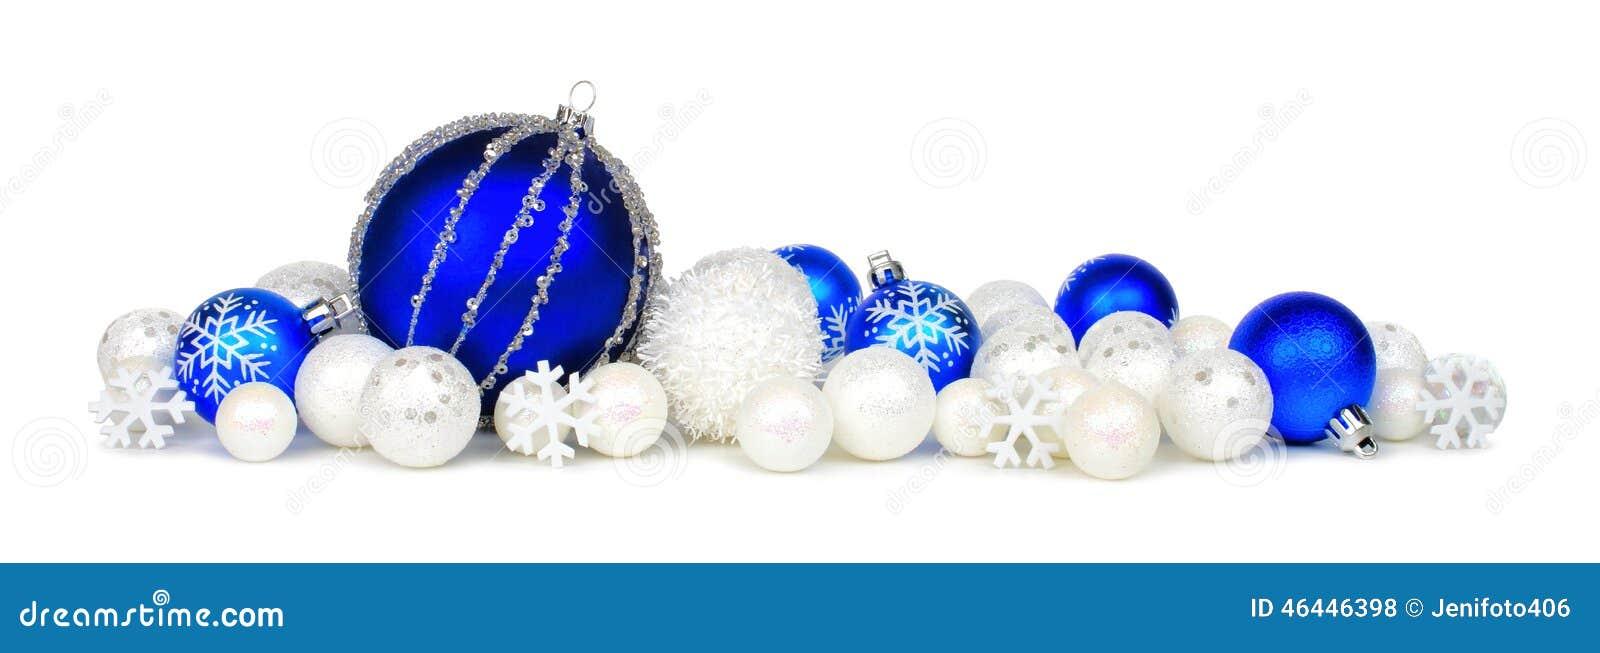 Blue And White Christmas Ornament Border Stock Photo - Image: 46446398